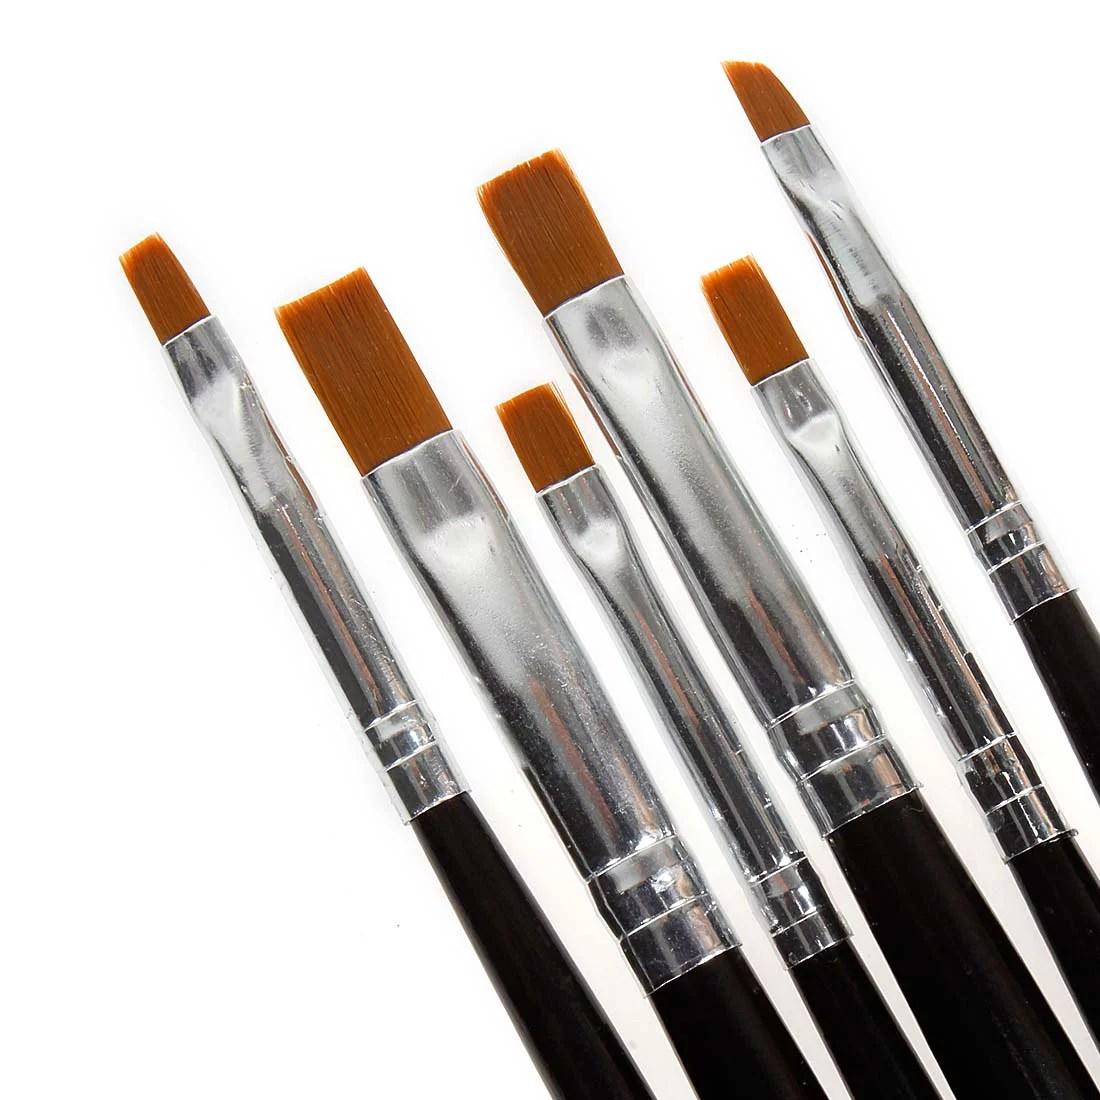 Bmc 6pc Nail Art Uv Gel Acrylic Salon Pen Painting Detailing Flat Brush Kit